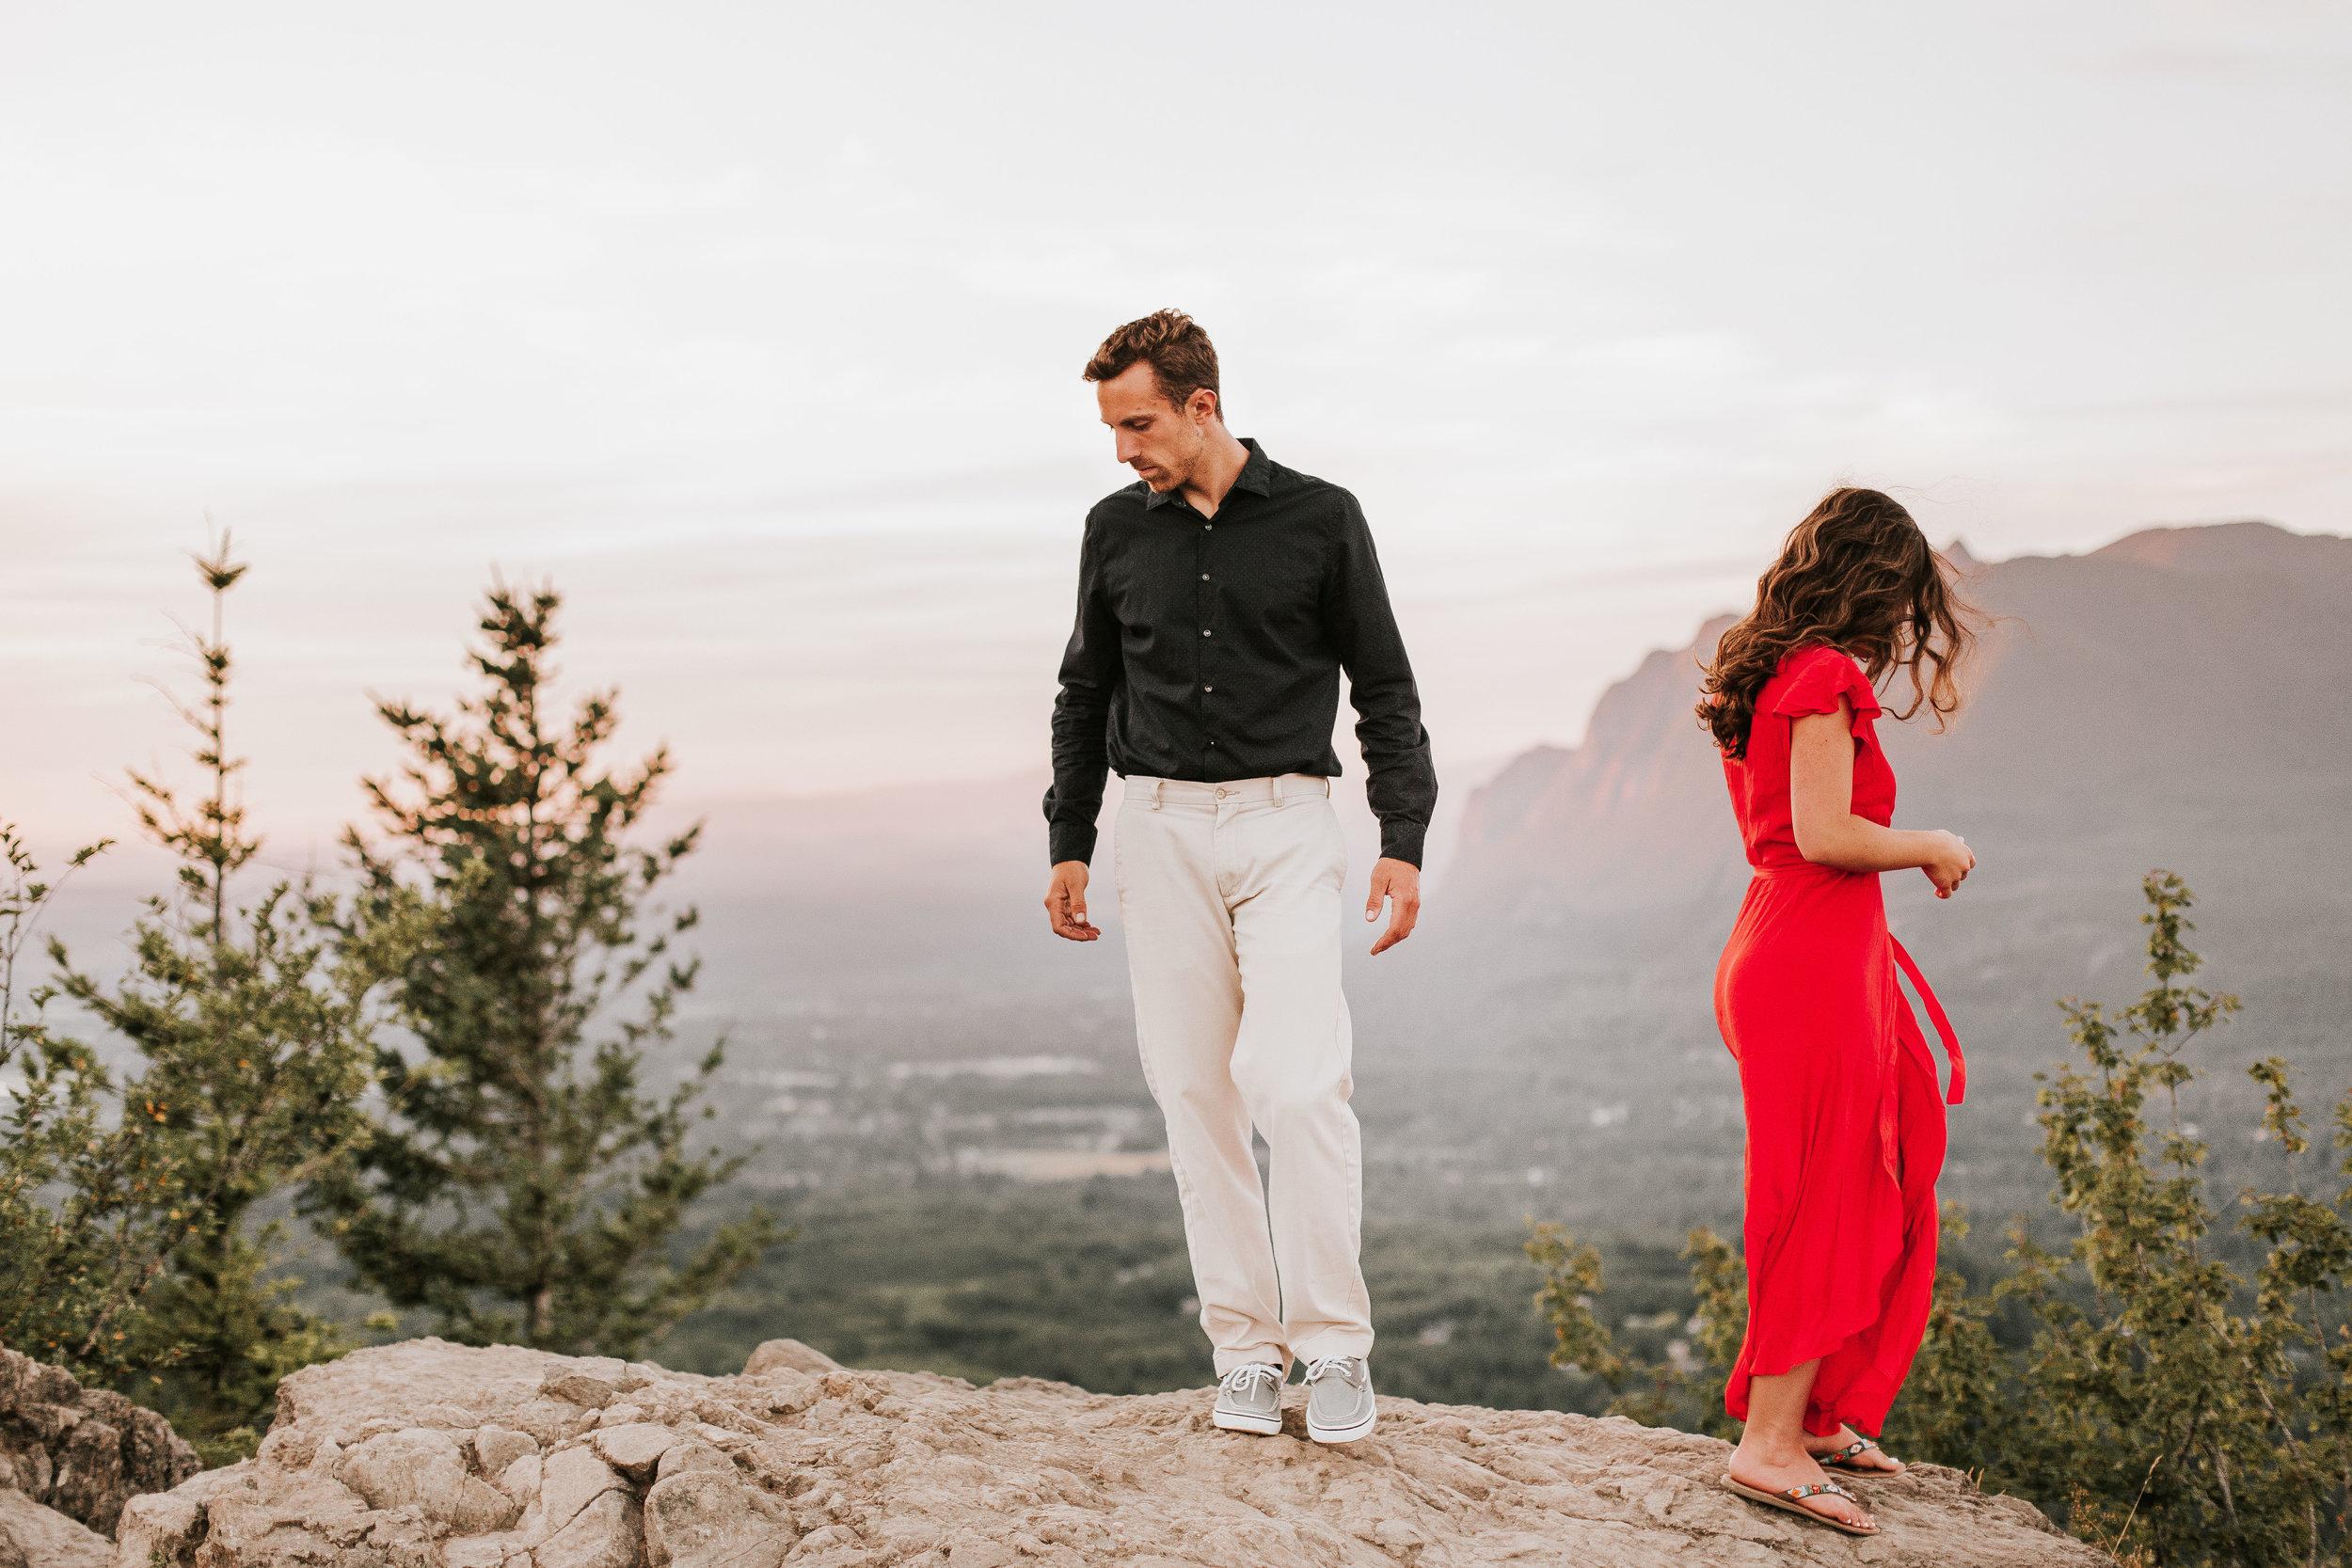 nicole-daacke-photography-rattlesnake-ridge-adventurous-engagement-session-hiking-seattle-washington-destinatino-elopement-intimate-wedding-photographer-16.jpg